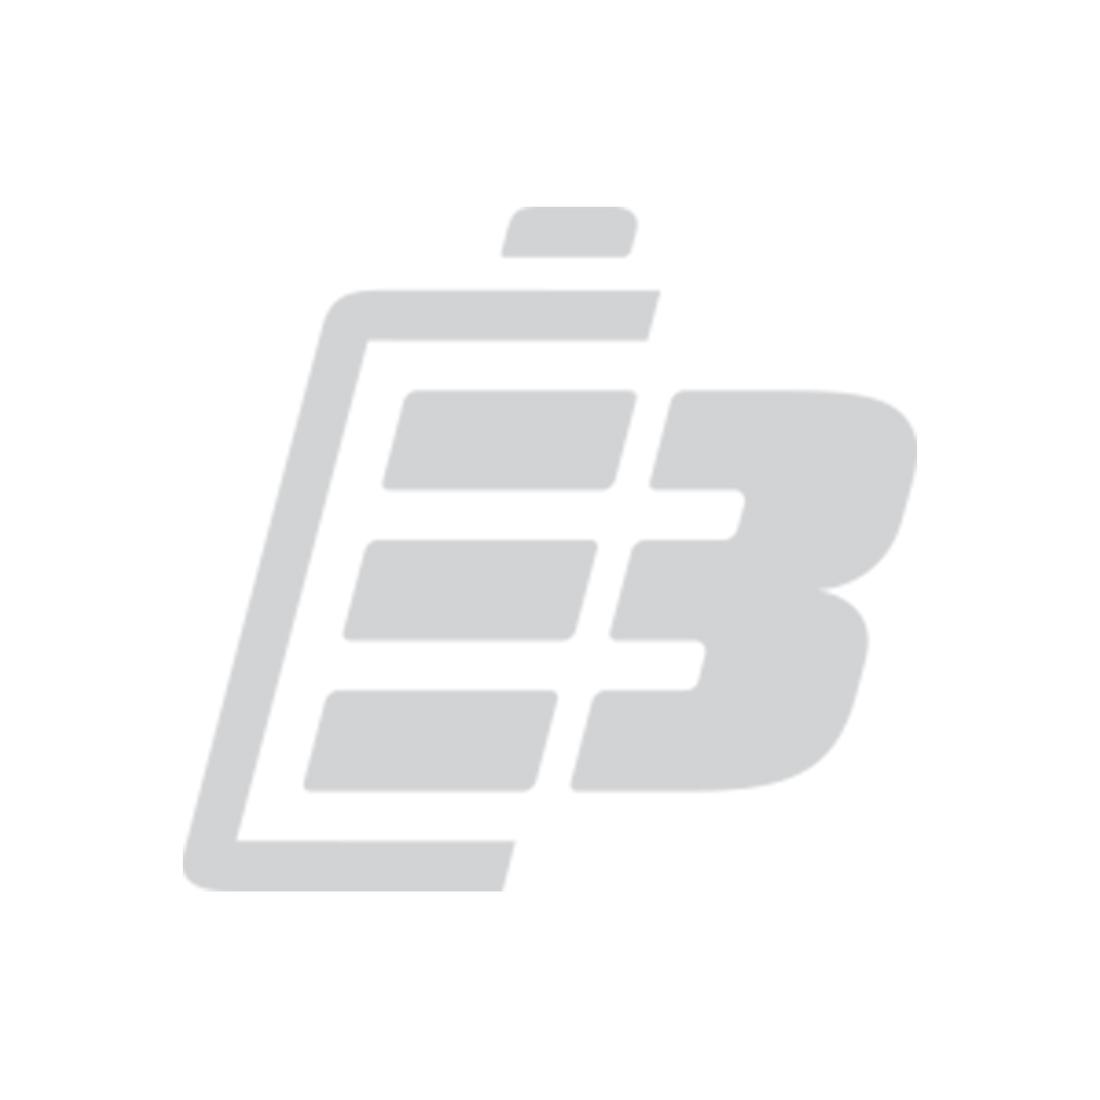 Laptop Adapter for Acer 19V 45W_1